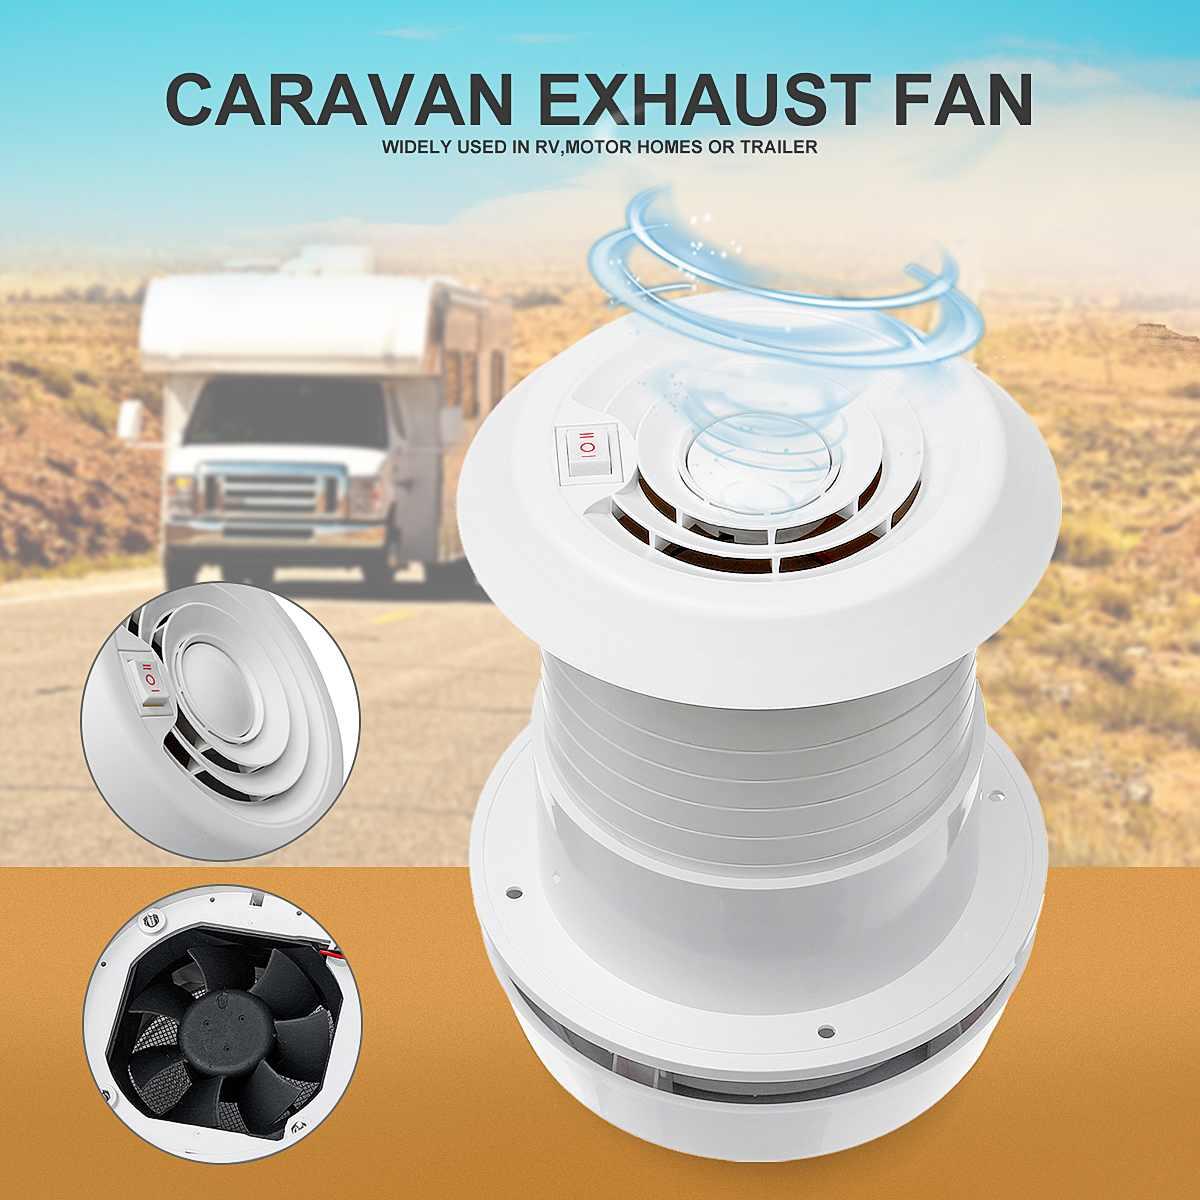 12V RV Energy-saving Motorhome Noiseless Roof Vent Ventilation Cooling Exhaust Fan For Travel Motor Homes Trailer